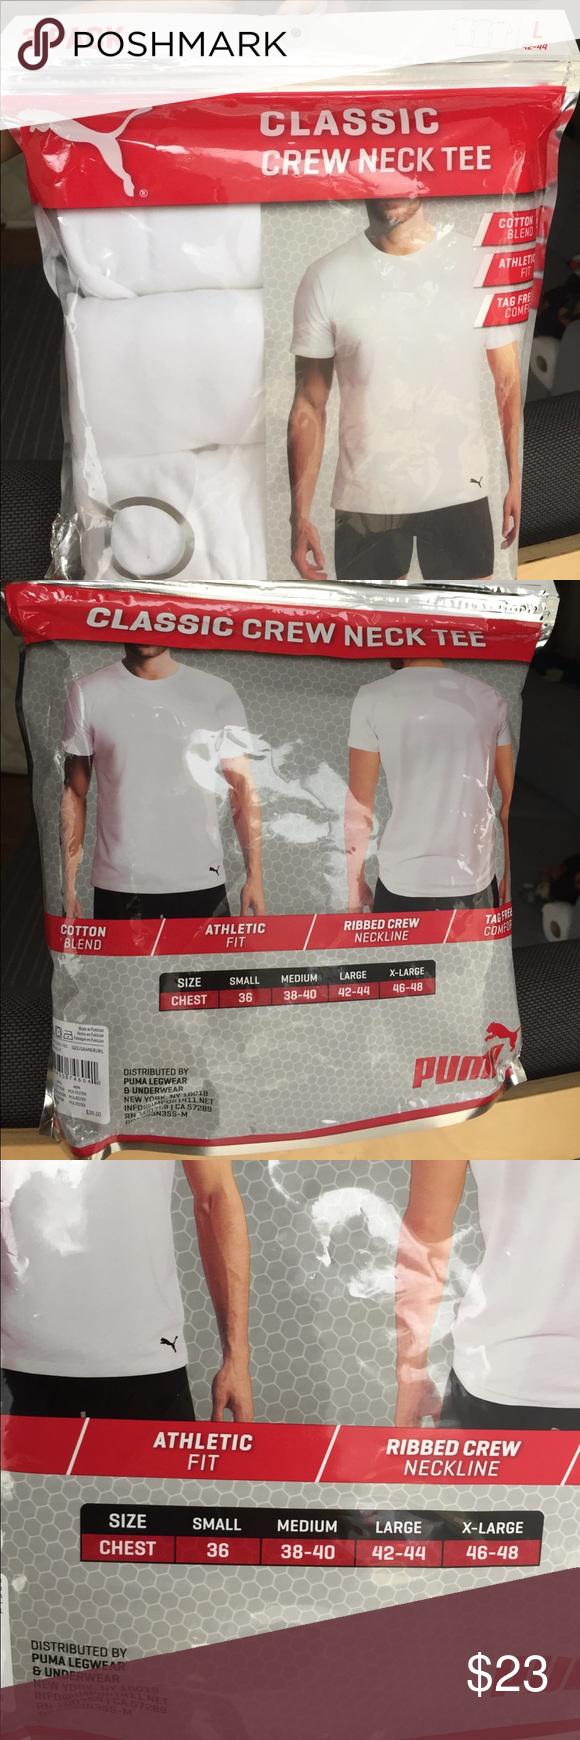 ca4aa2ea362 PUMA Men Classic Crew Neck Tee (LARGE) Puma Men's Classic Crew Neck Tee T